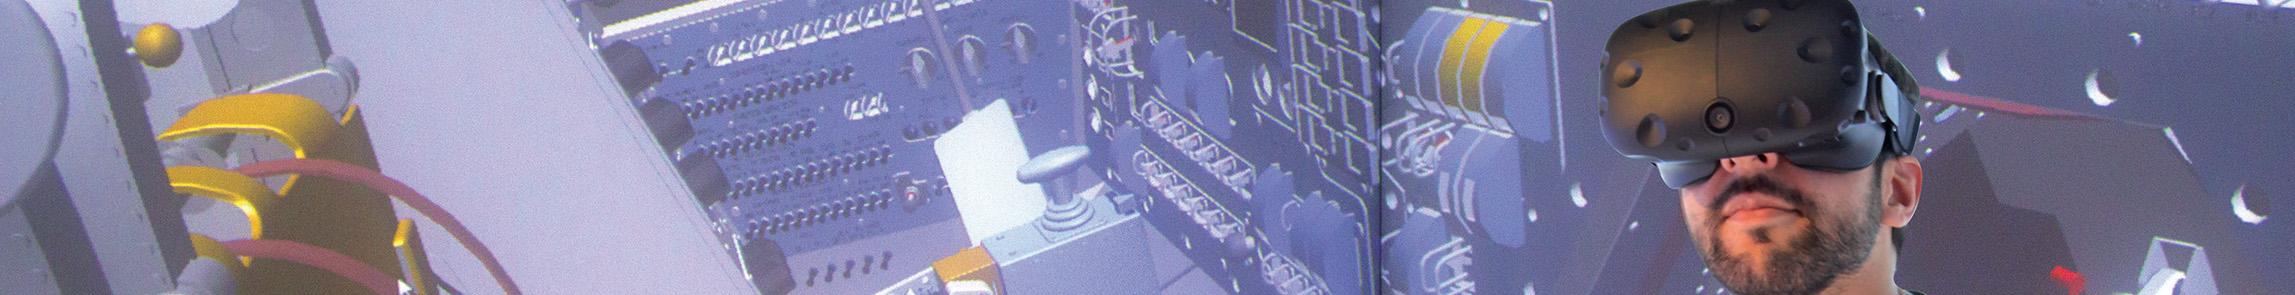 TechVizXL displayed in a HTC Vive